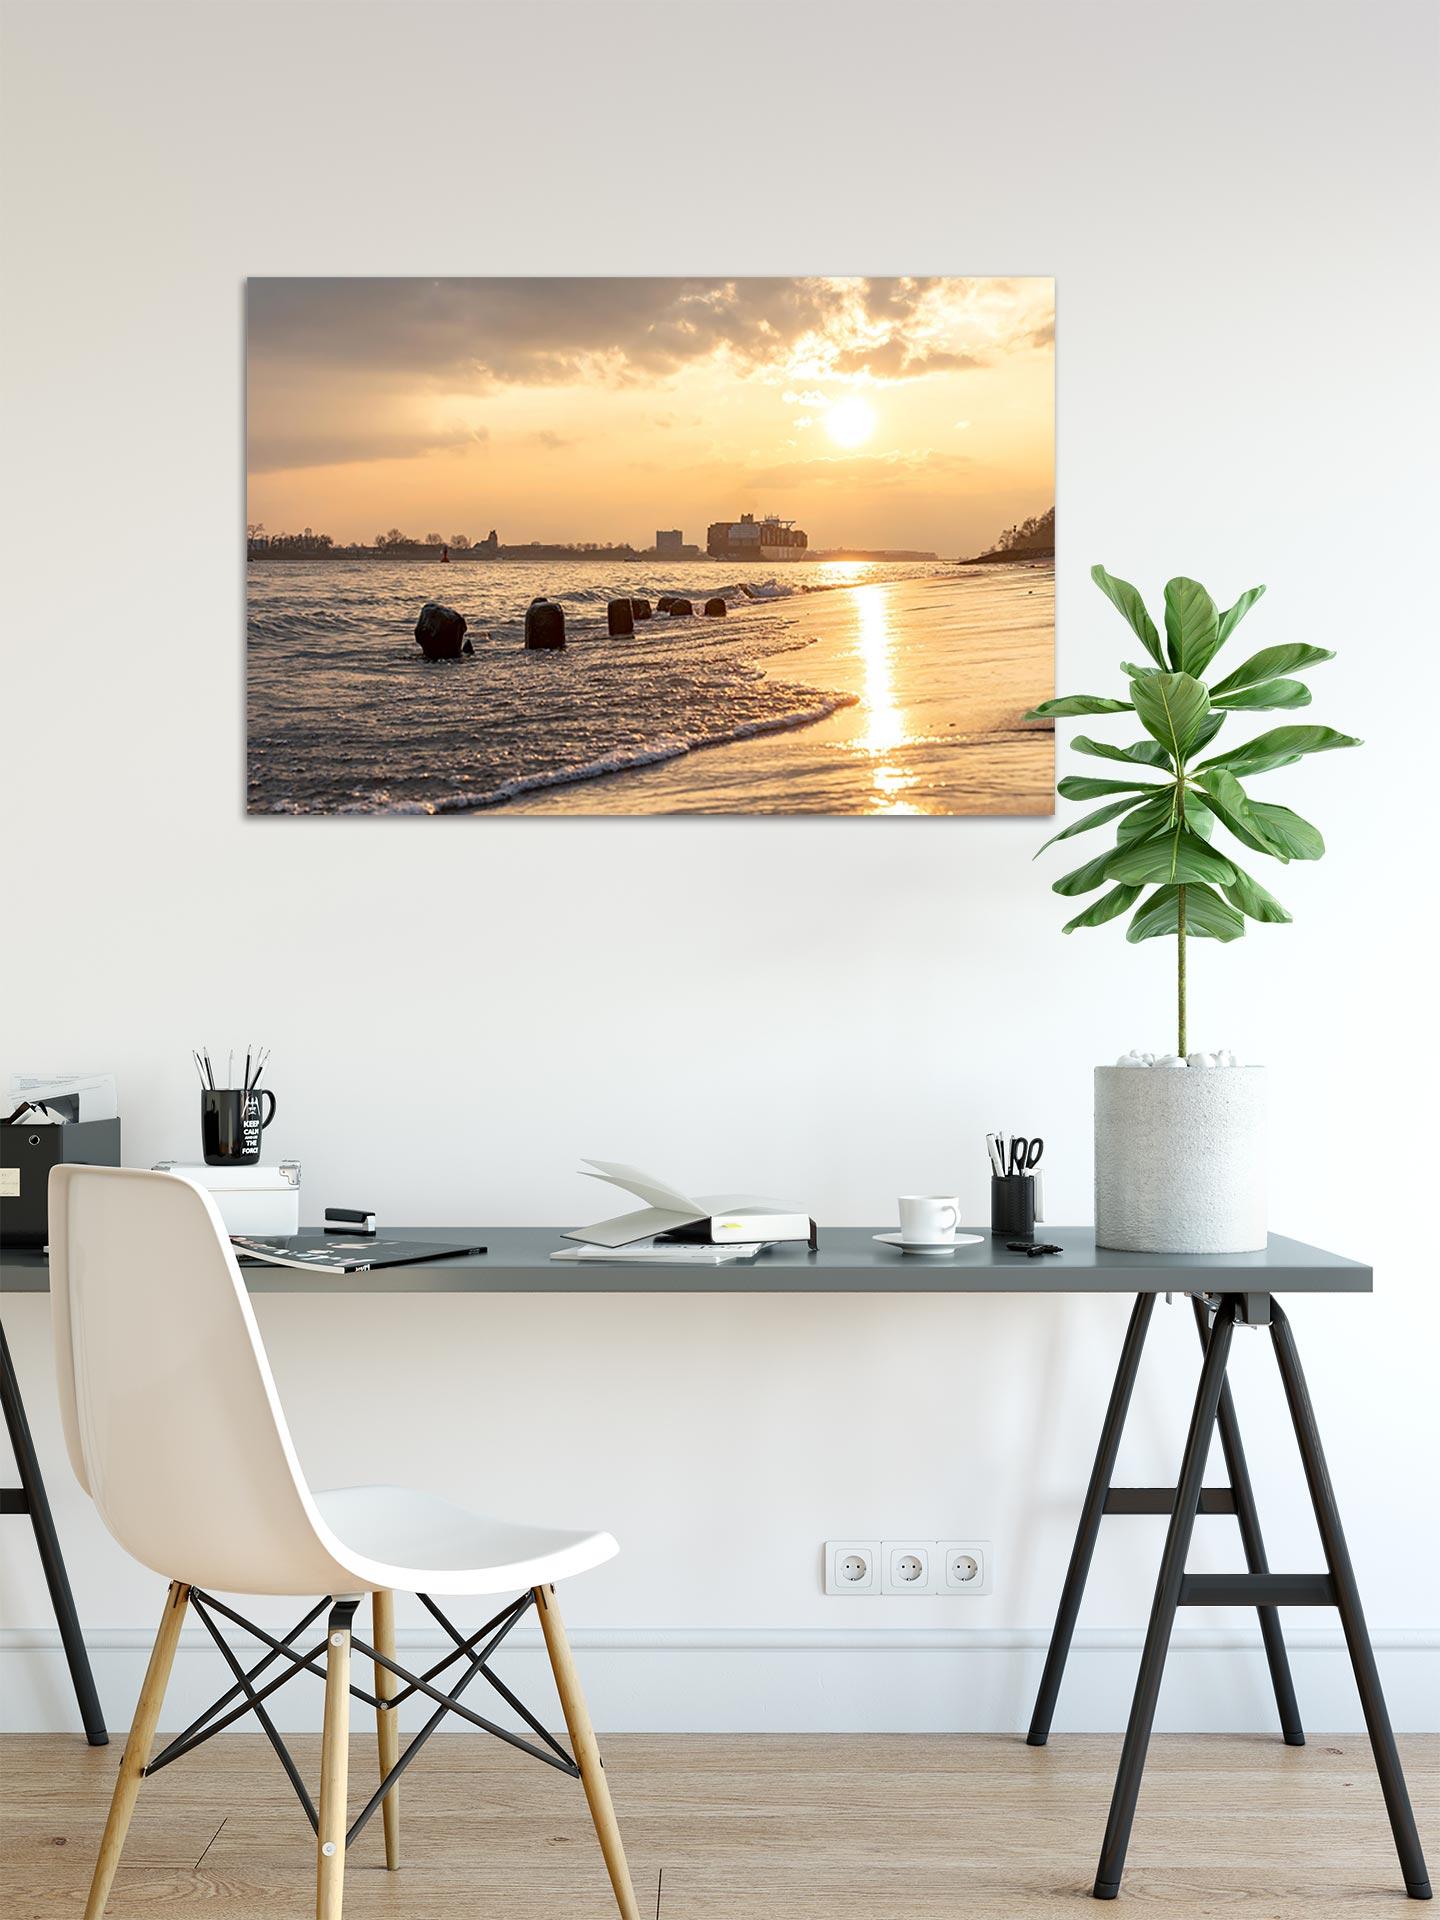 NL084-sommerabend-elbe-hamburg-wandbild-bild-auf-leinwand-acrylglas-aludibond-arbeitszimmer